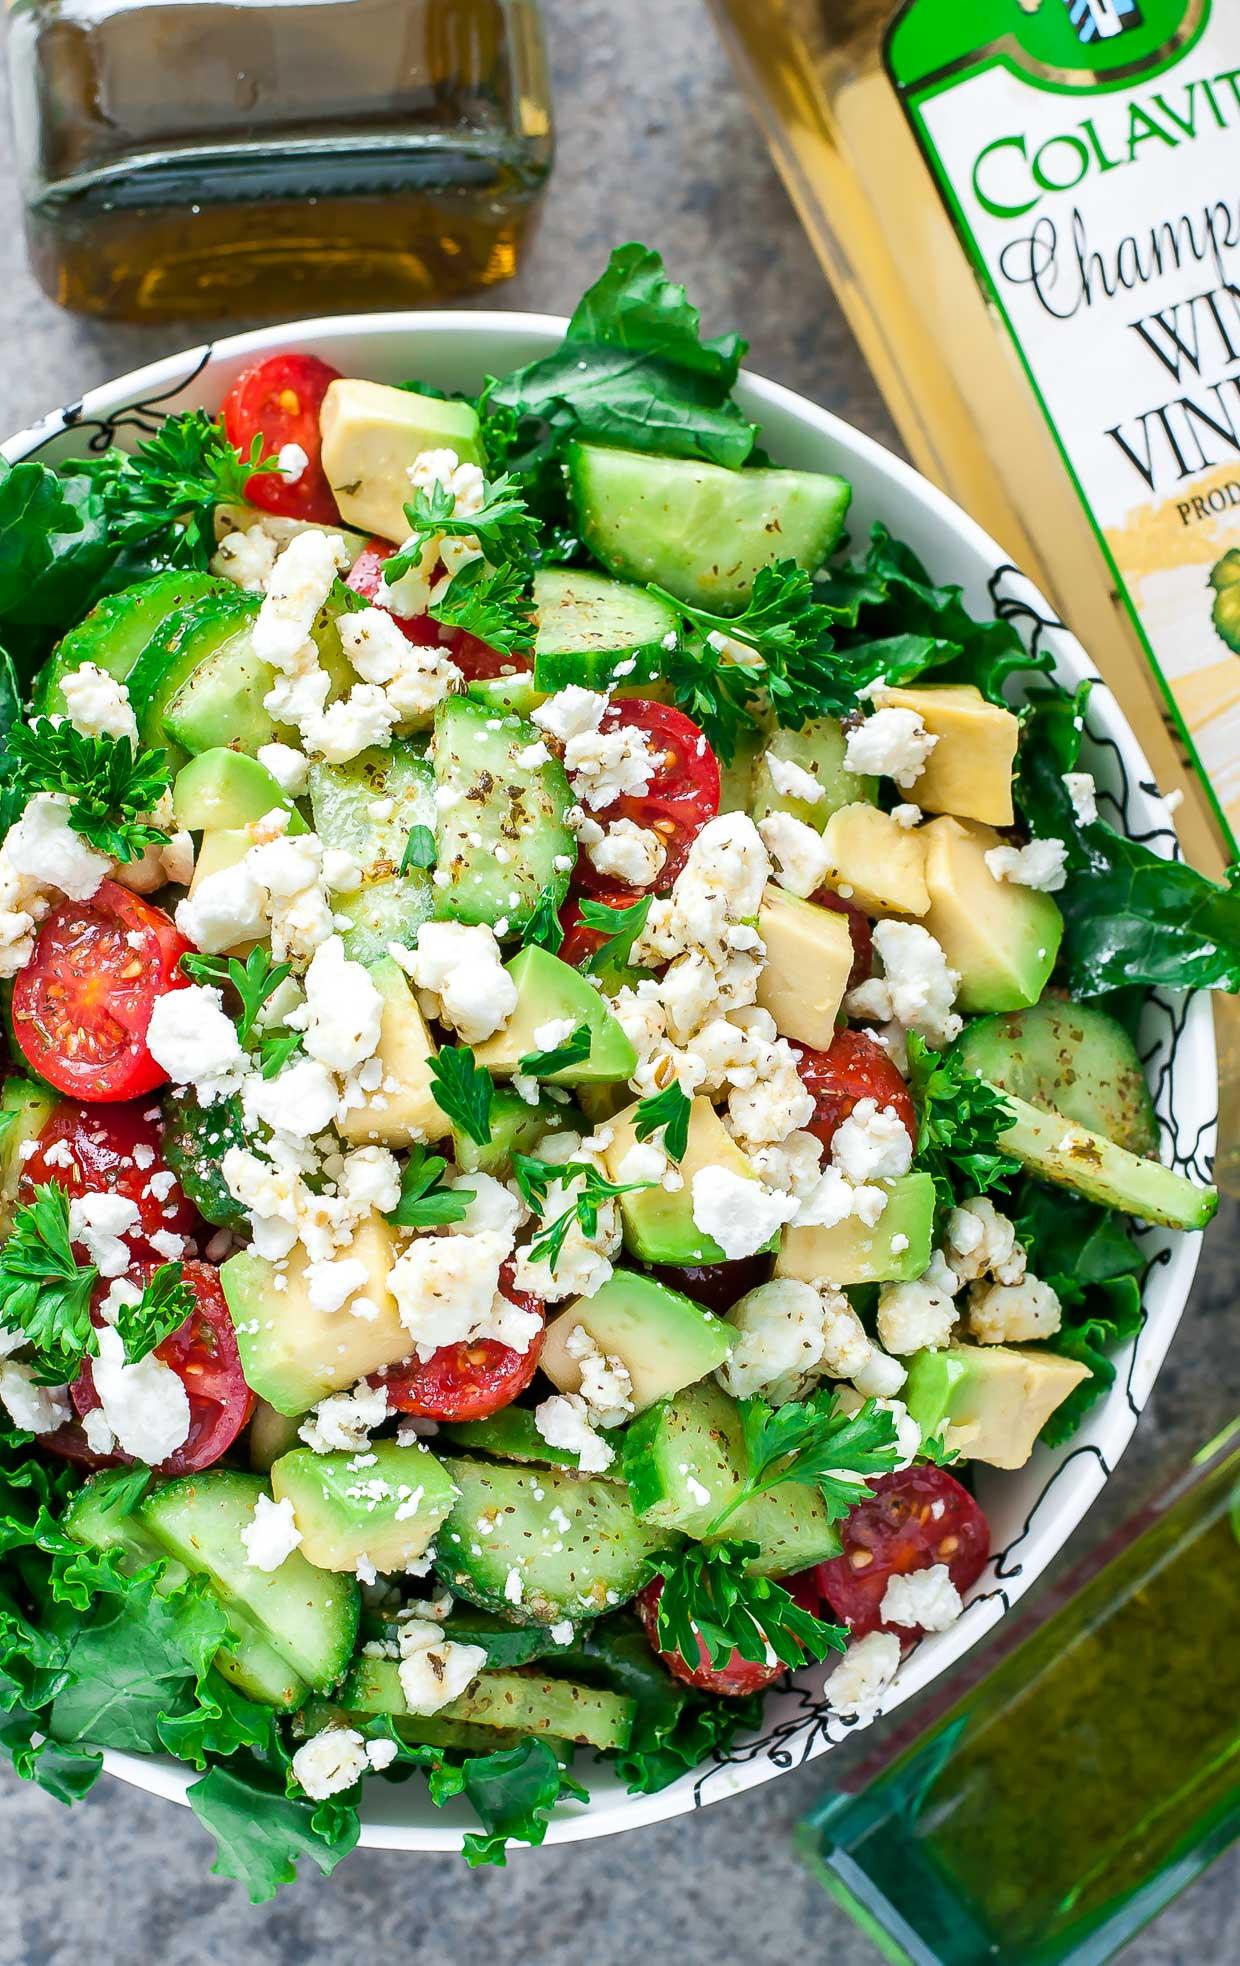 Healthy Kale Salad Recipes  Greek Kale Salad Recipe with Easy Homemade Greek Dressing